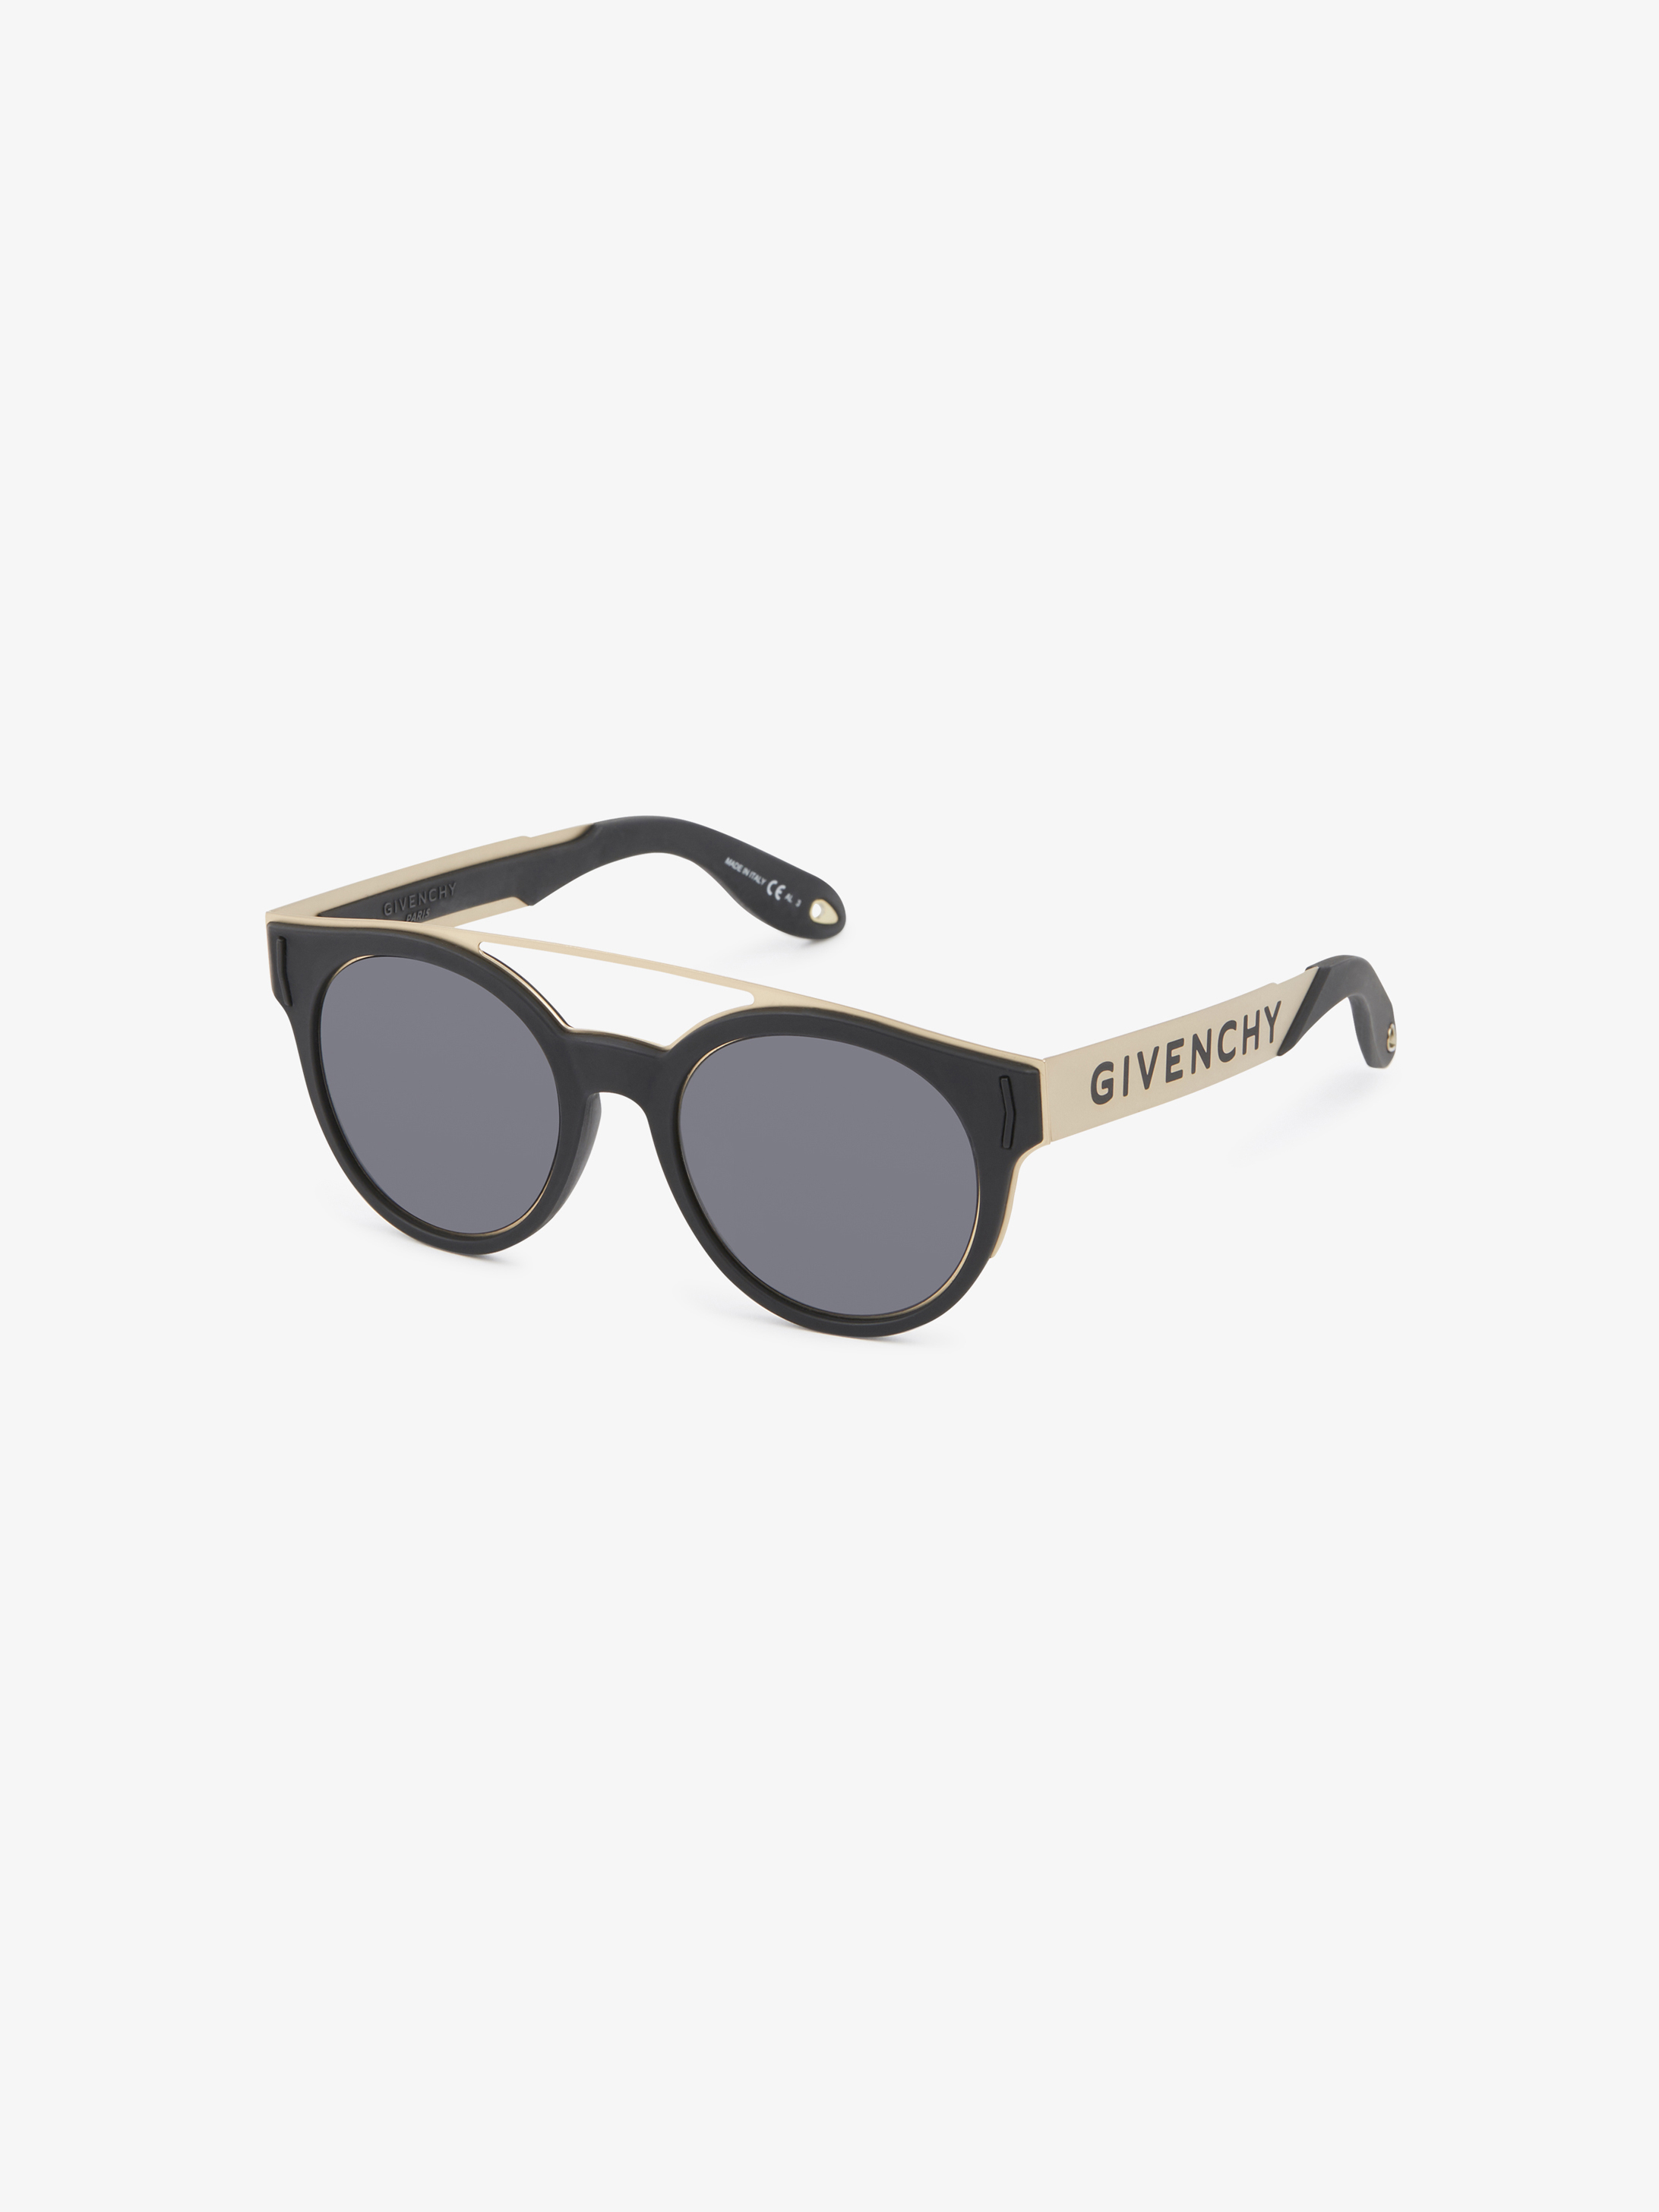 GIVENCHY logo sunglasses